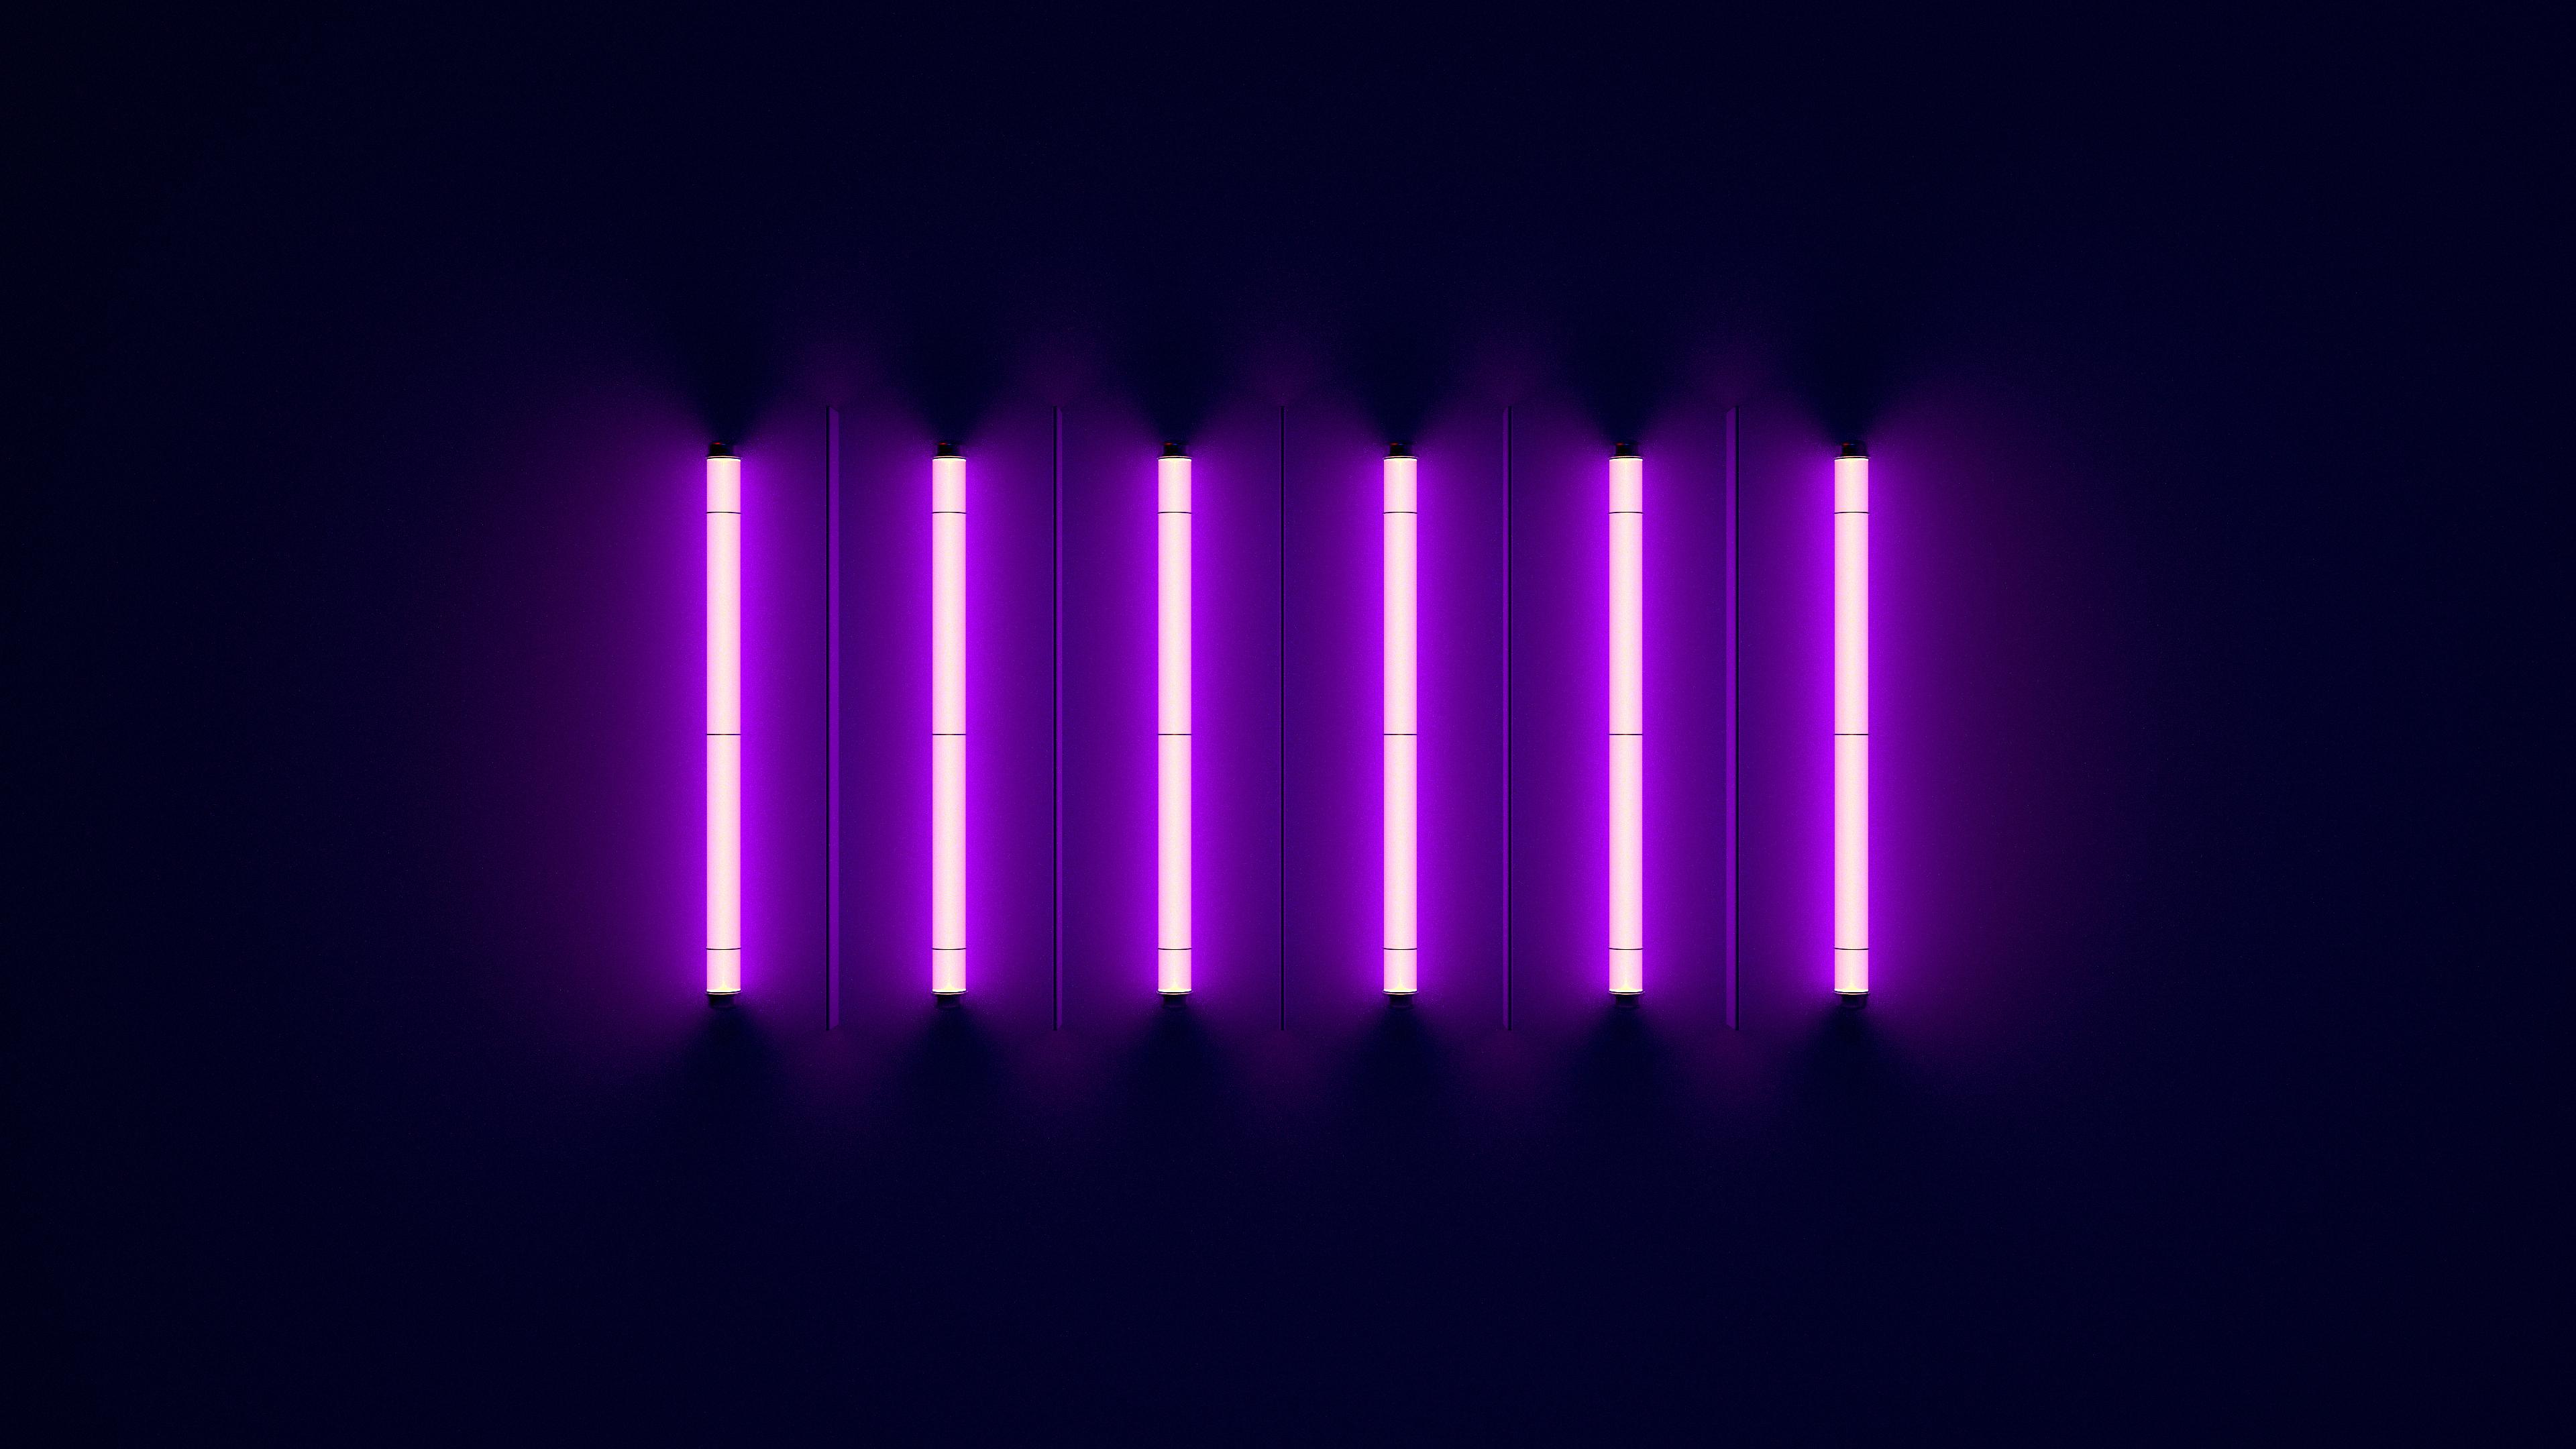 Neon 4k Ultra HD Wallpaper Background Image 3840x2160